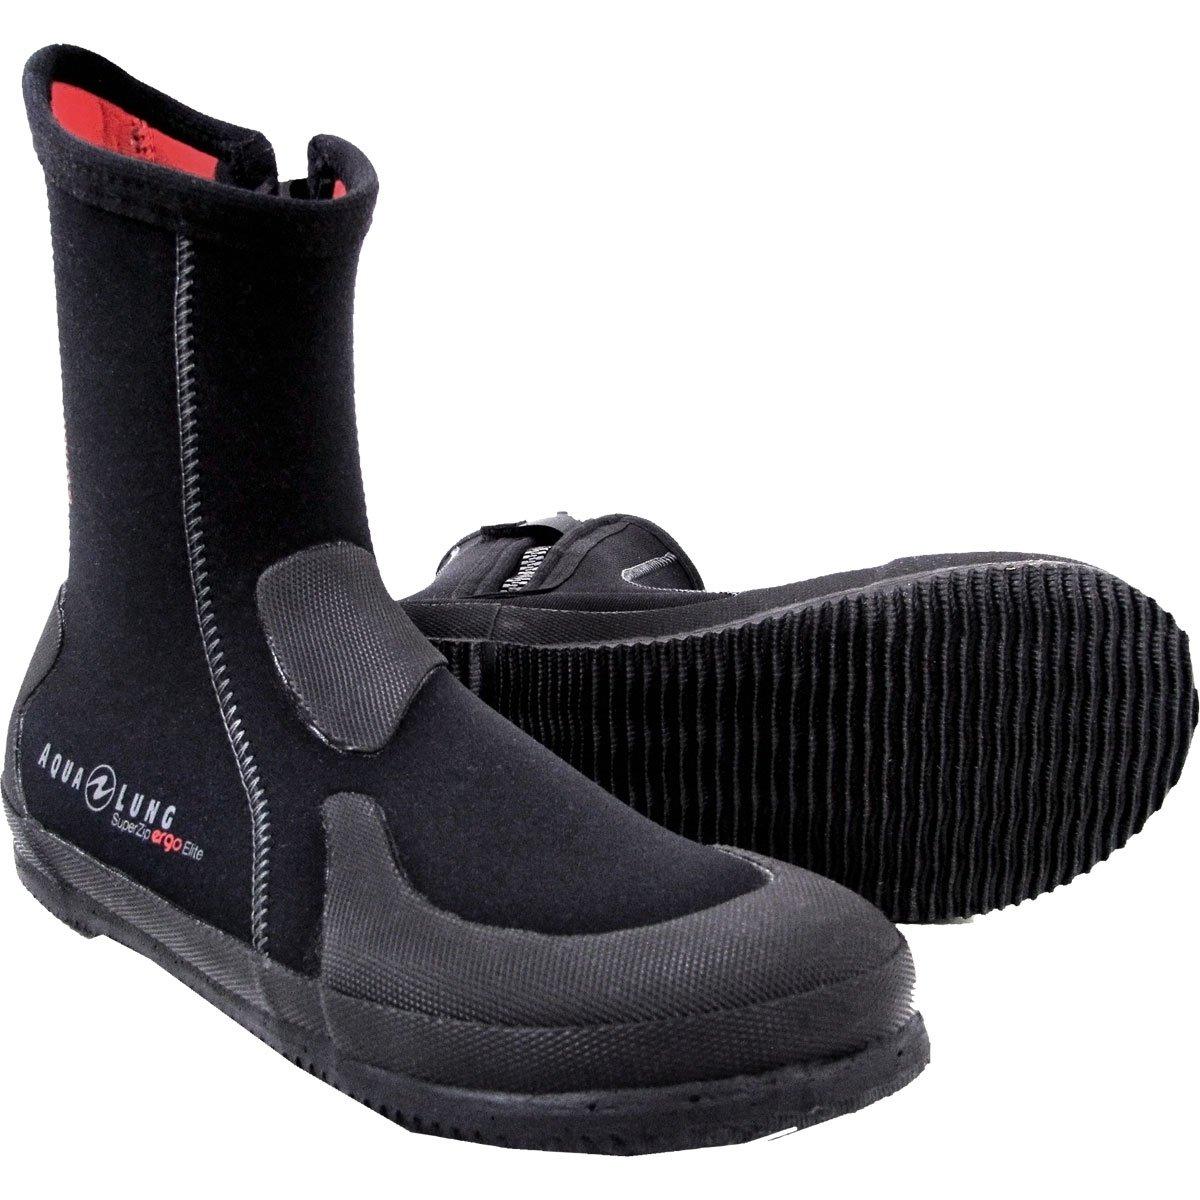 5mm Superzip Ergo Boot